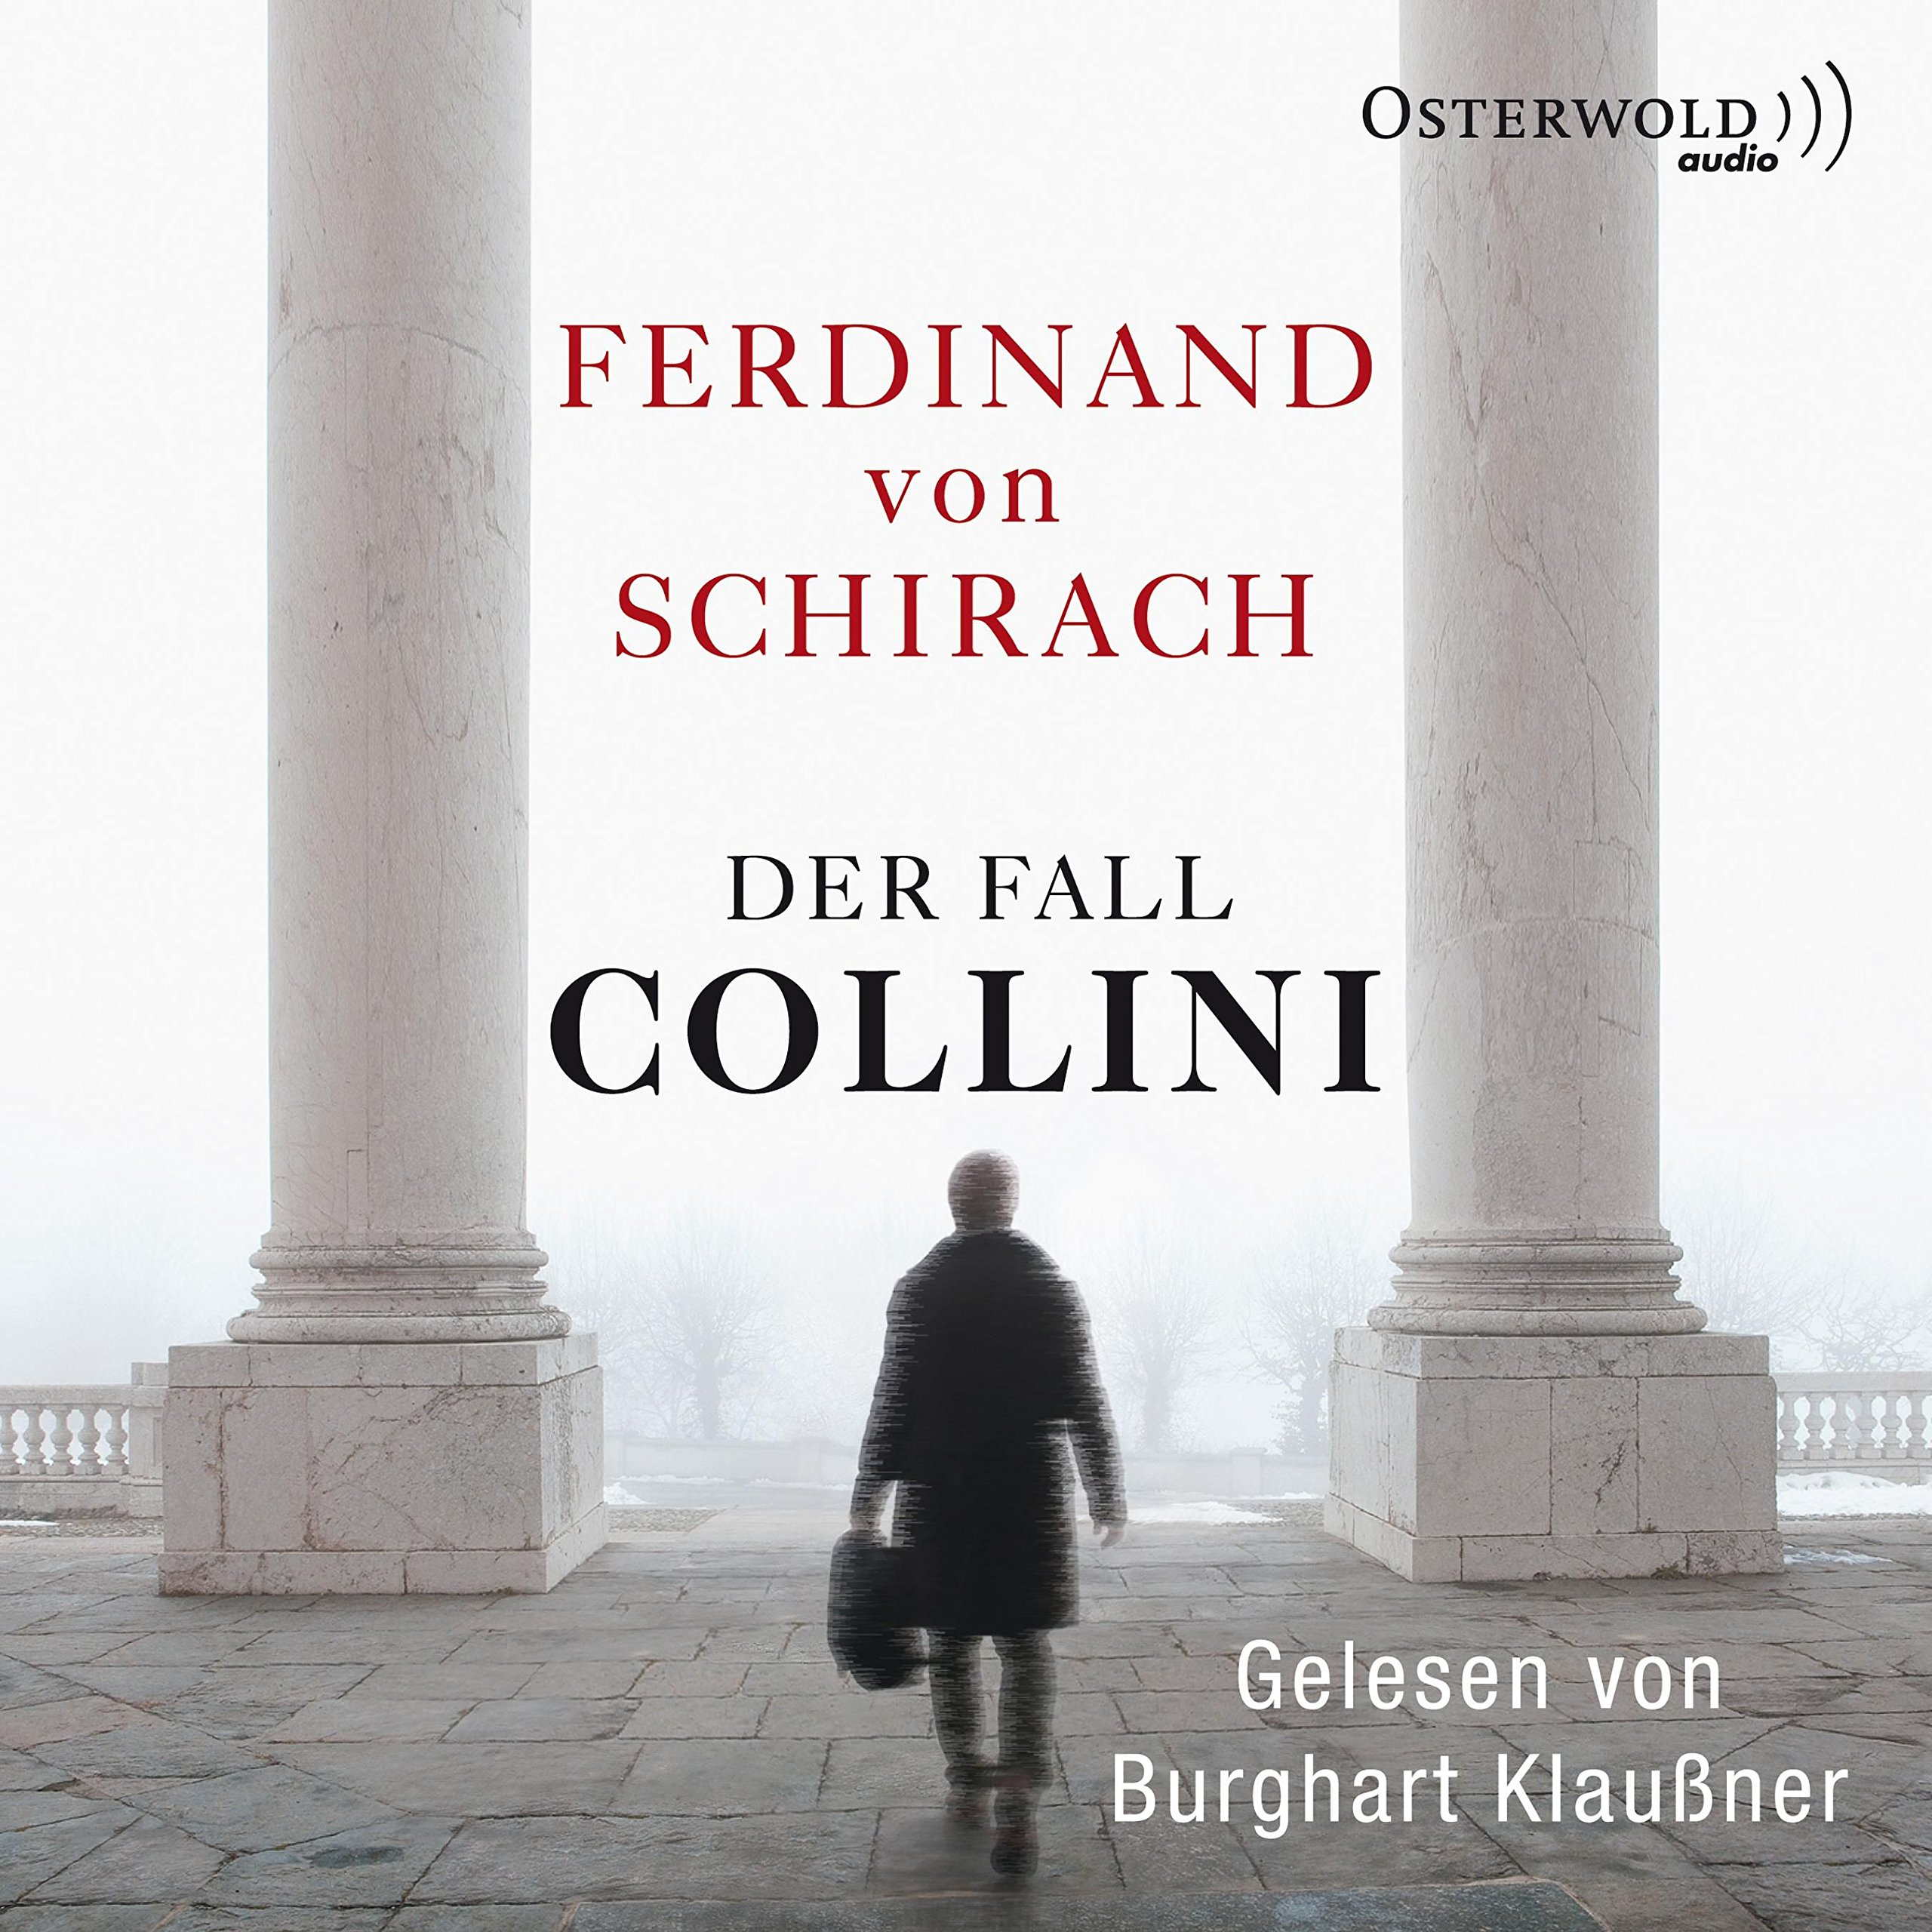 Der Fall Collini: 3 CDs